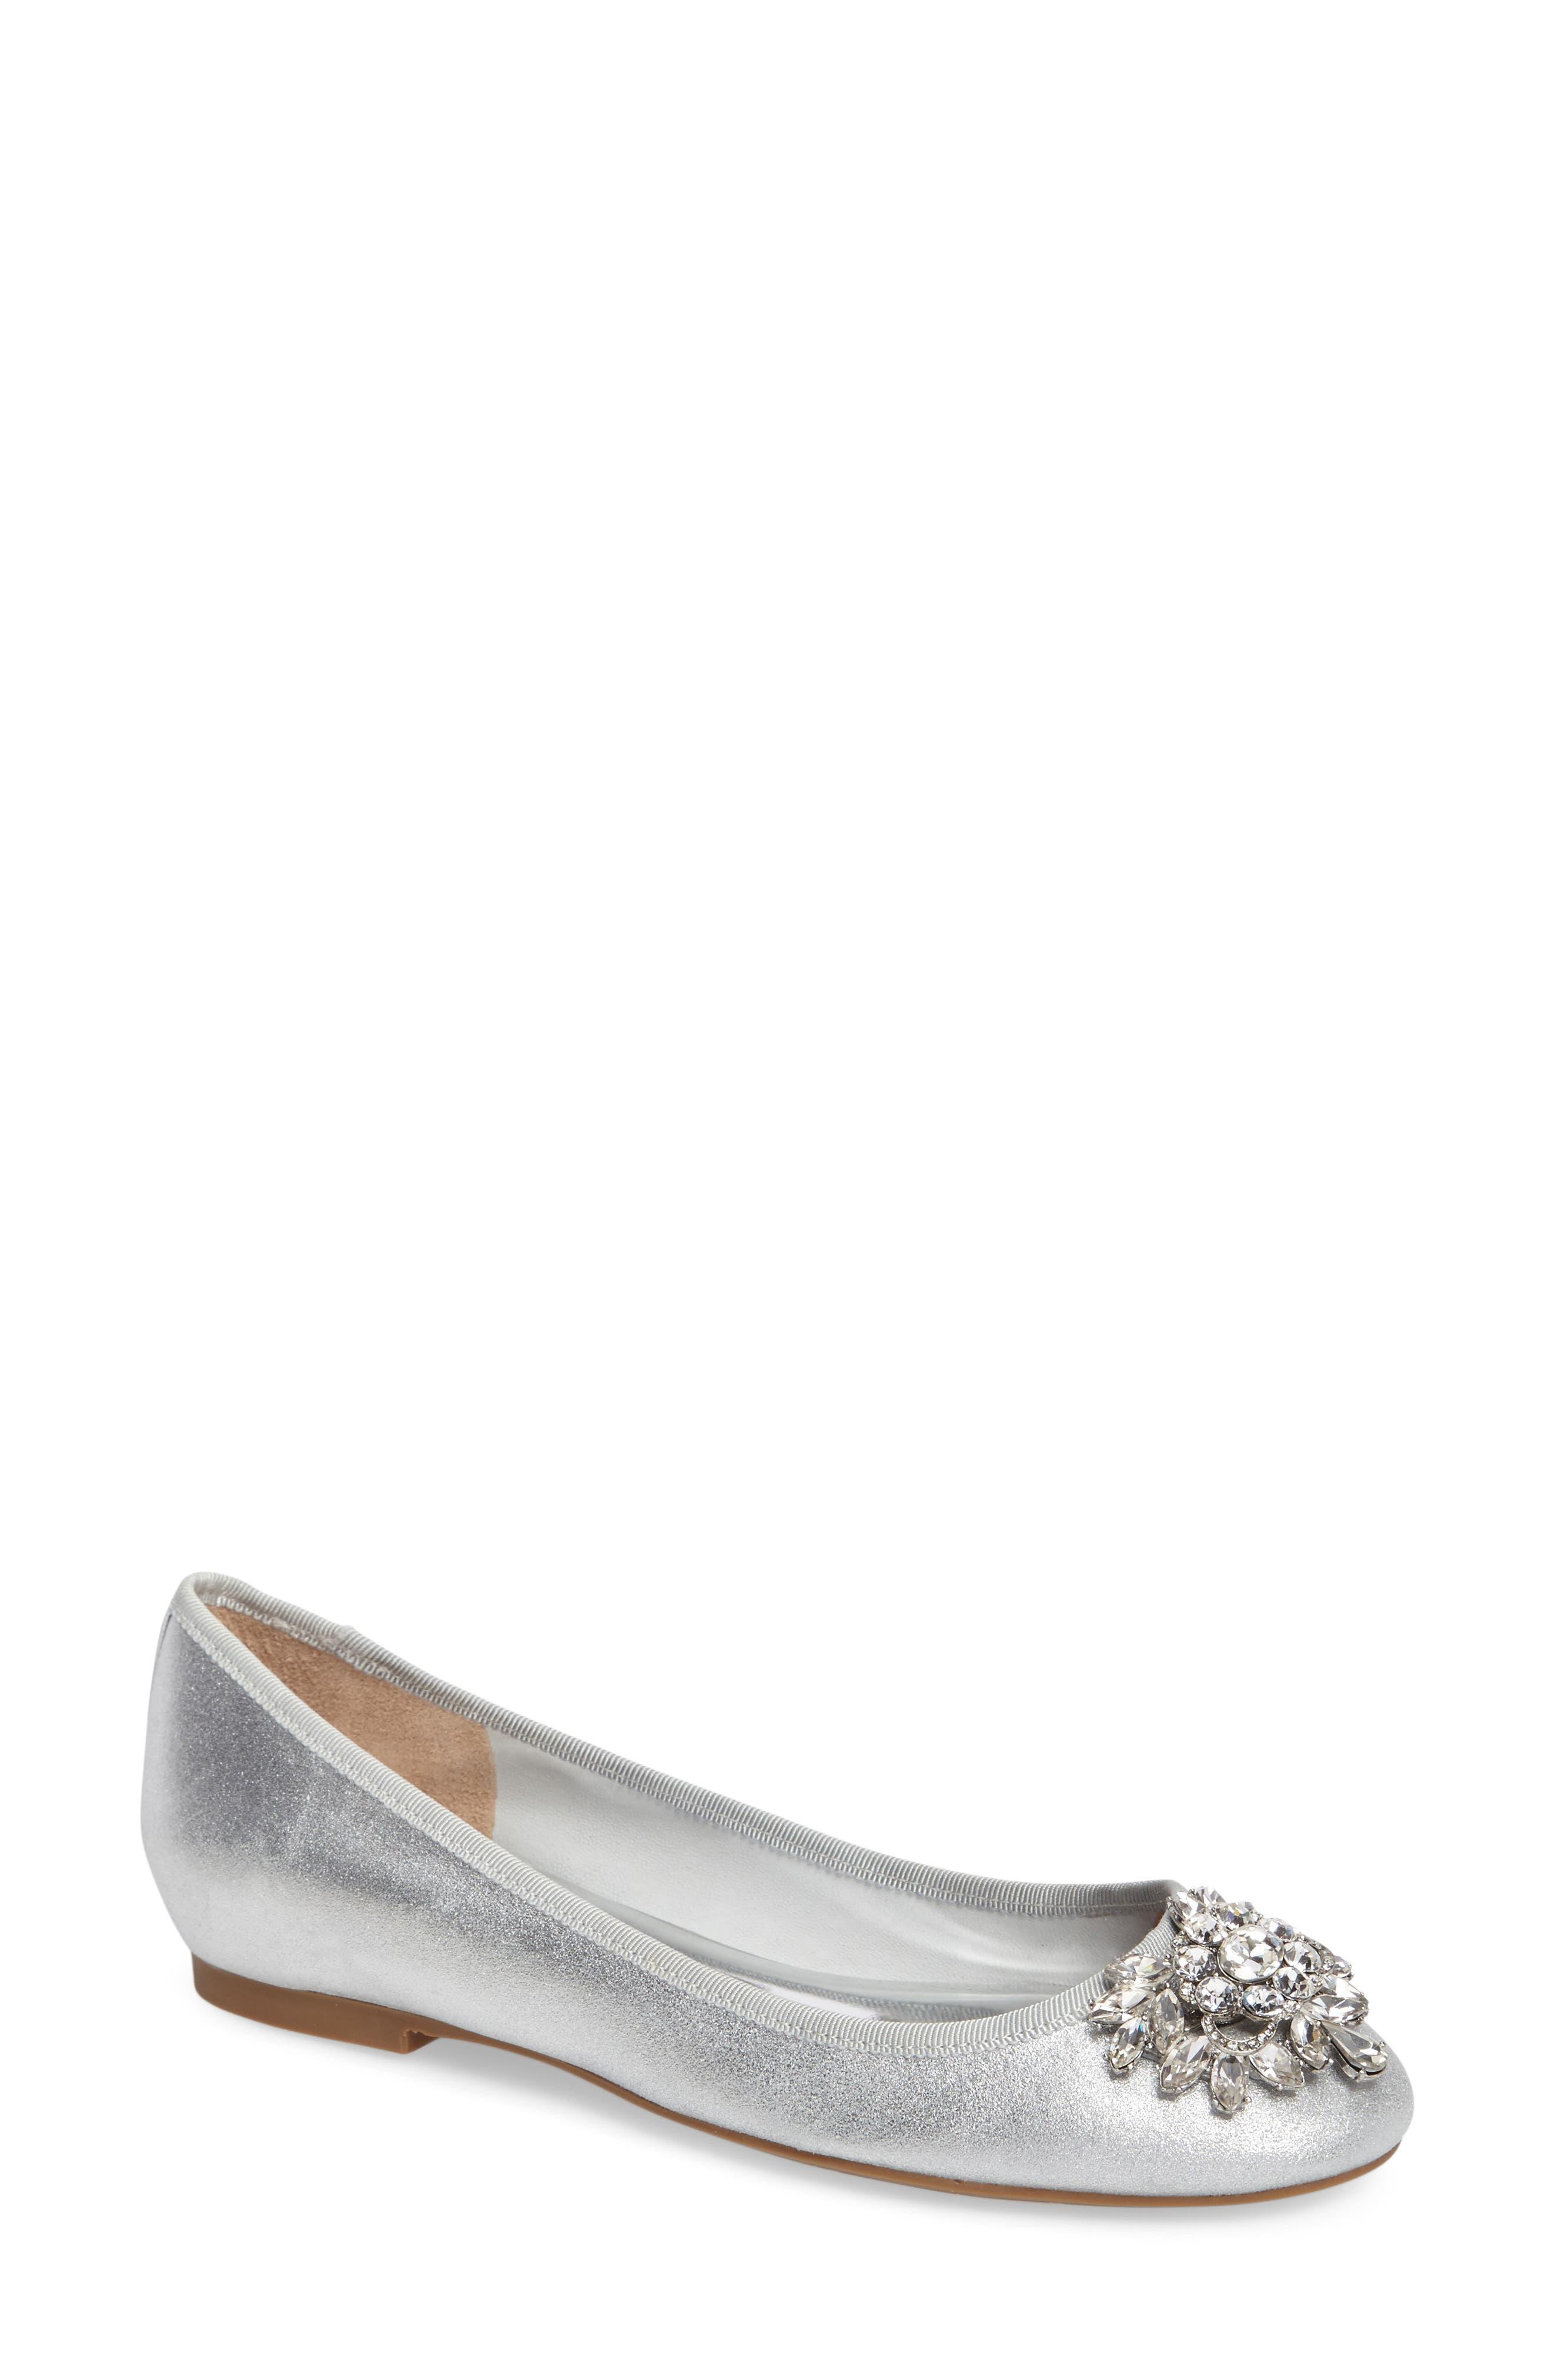 Bianca Embellished Ballet Flat,                         Main,                         color, Silver Metallic Suede